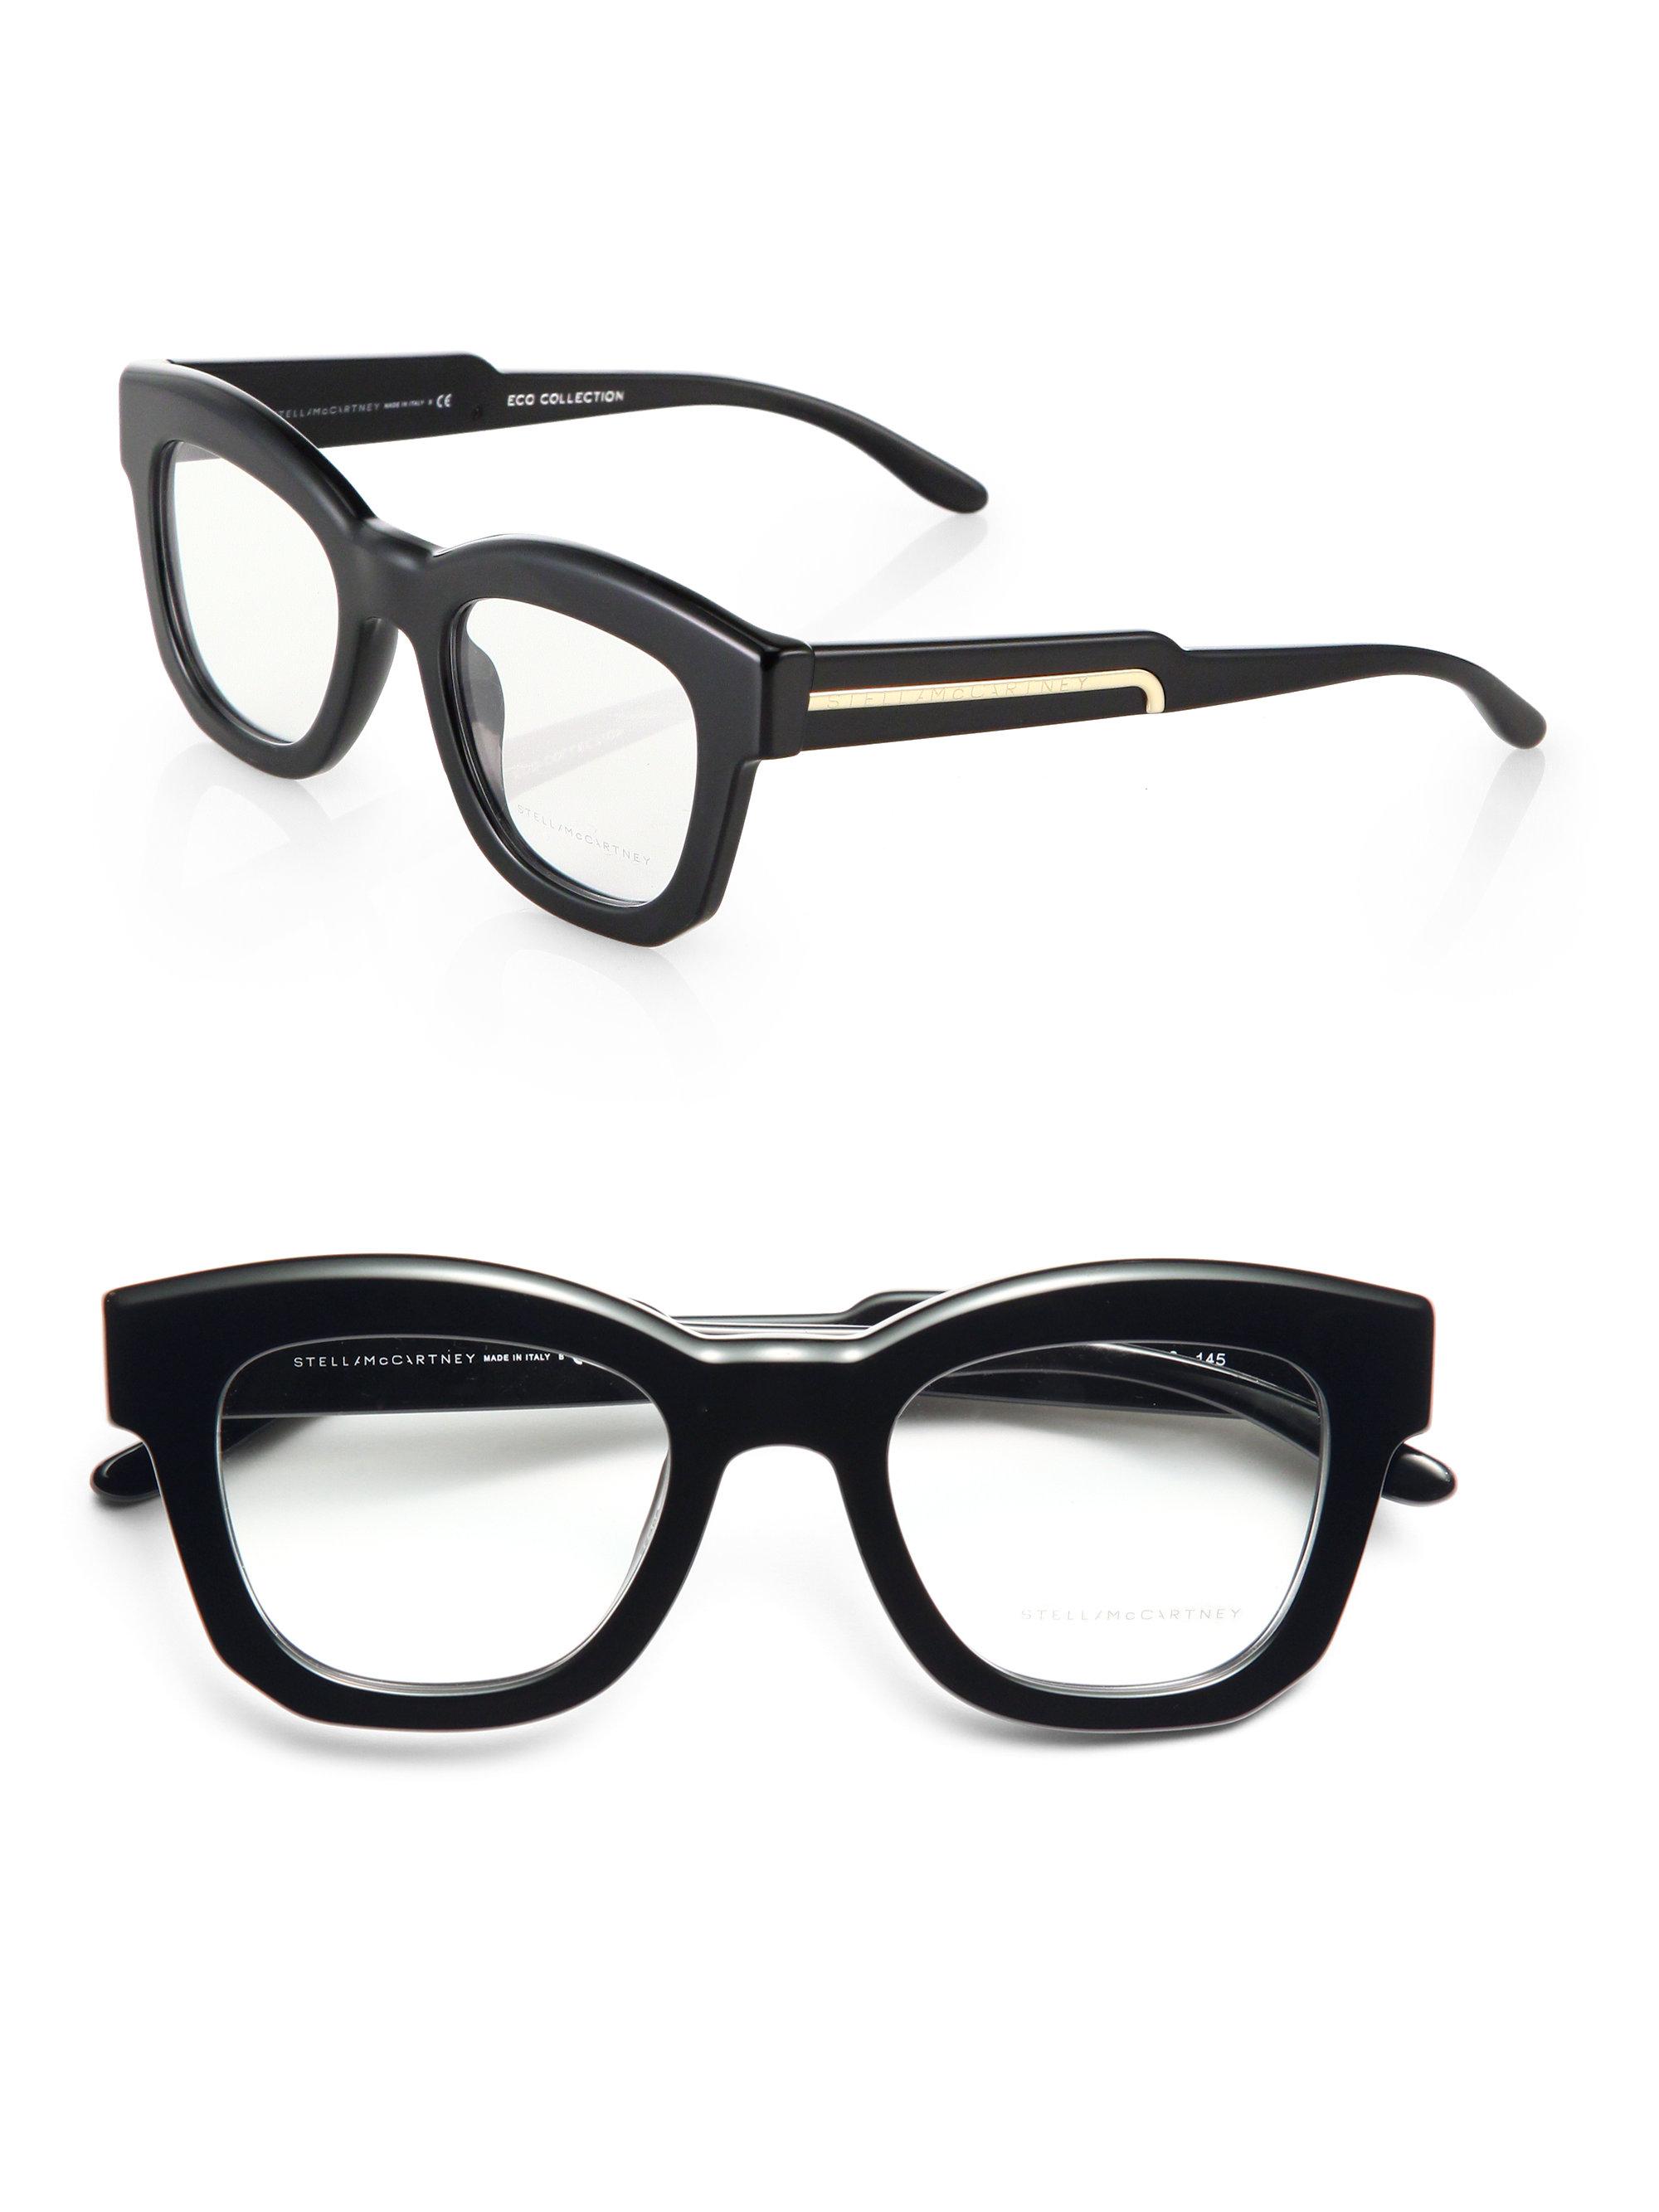 Stella Mccartney Eyewear square designed sunglasses Sale Wide Range Of Buy Cheap New Best Wholesale For Sale Finishline Sale Online PbhKp9e0yz